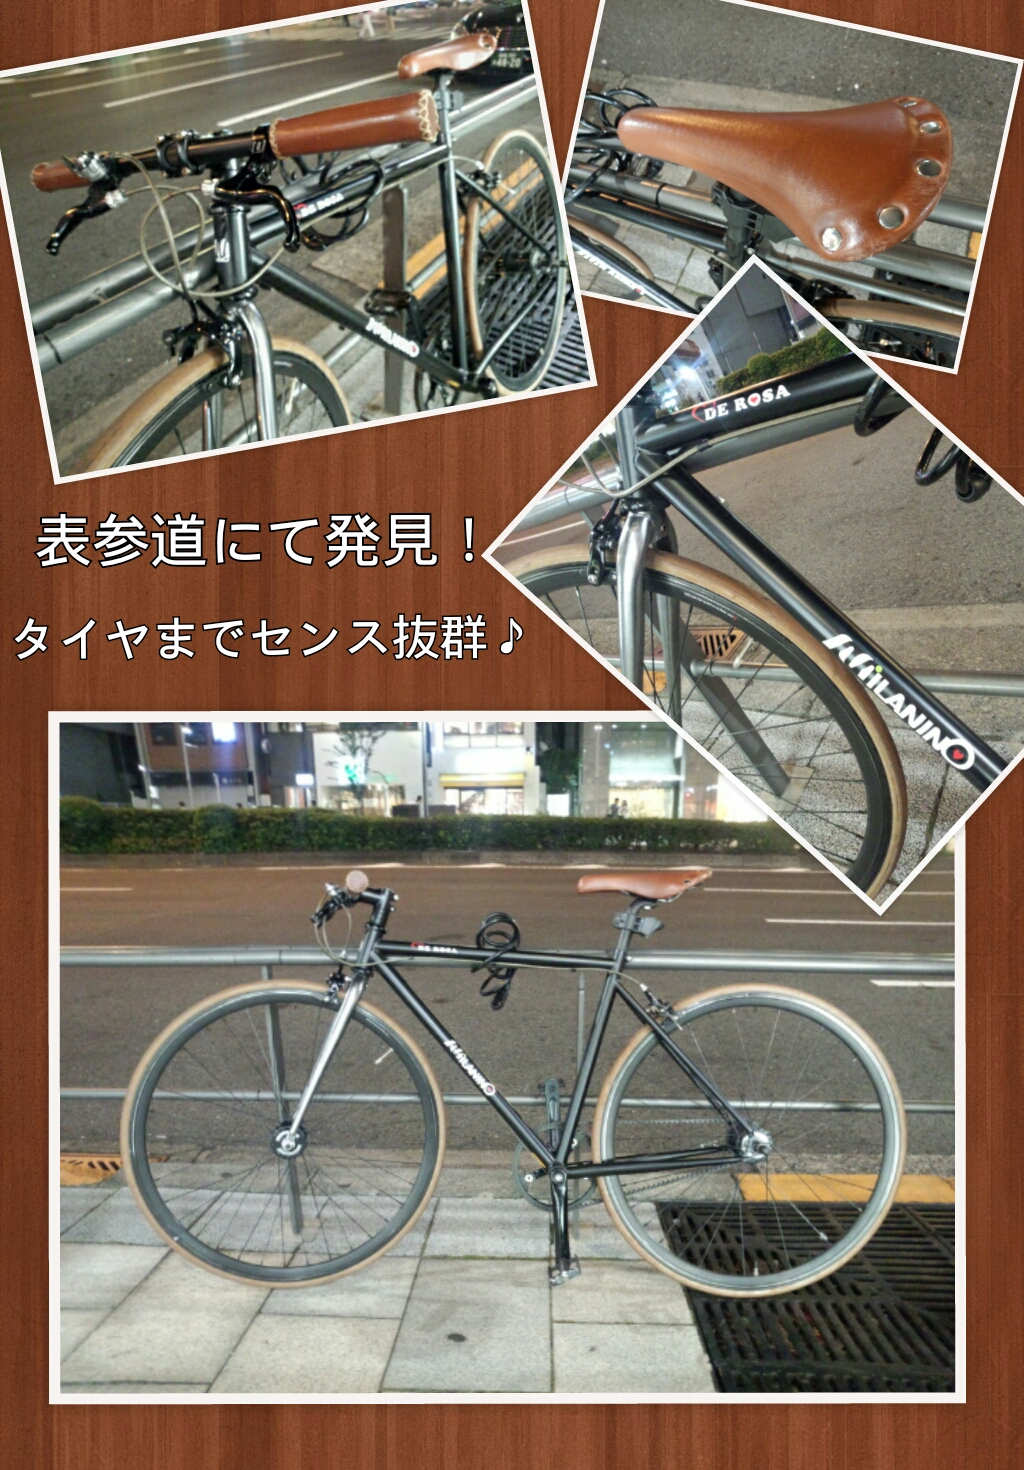 PhotoGrid_1379857757606.jpg